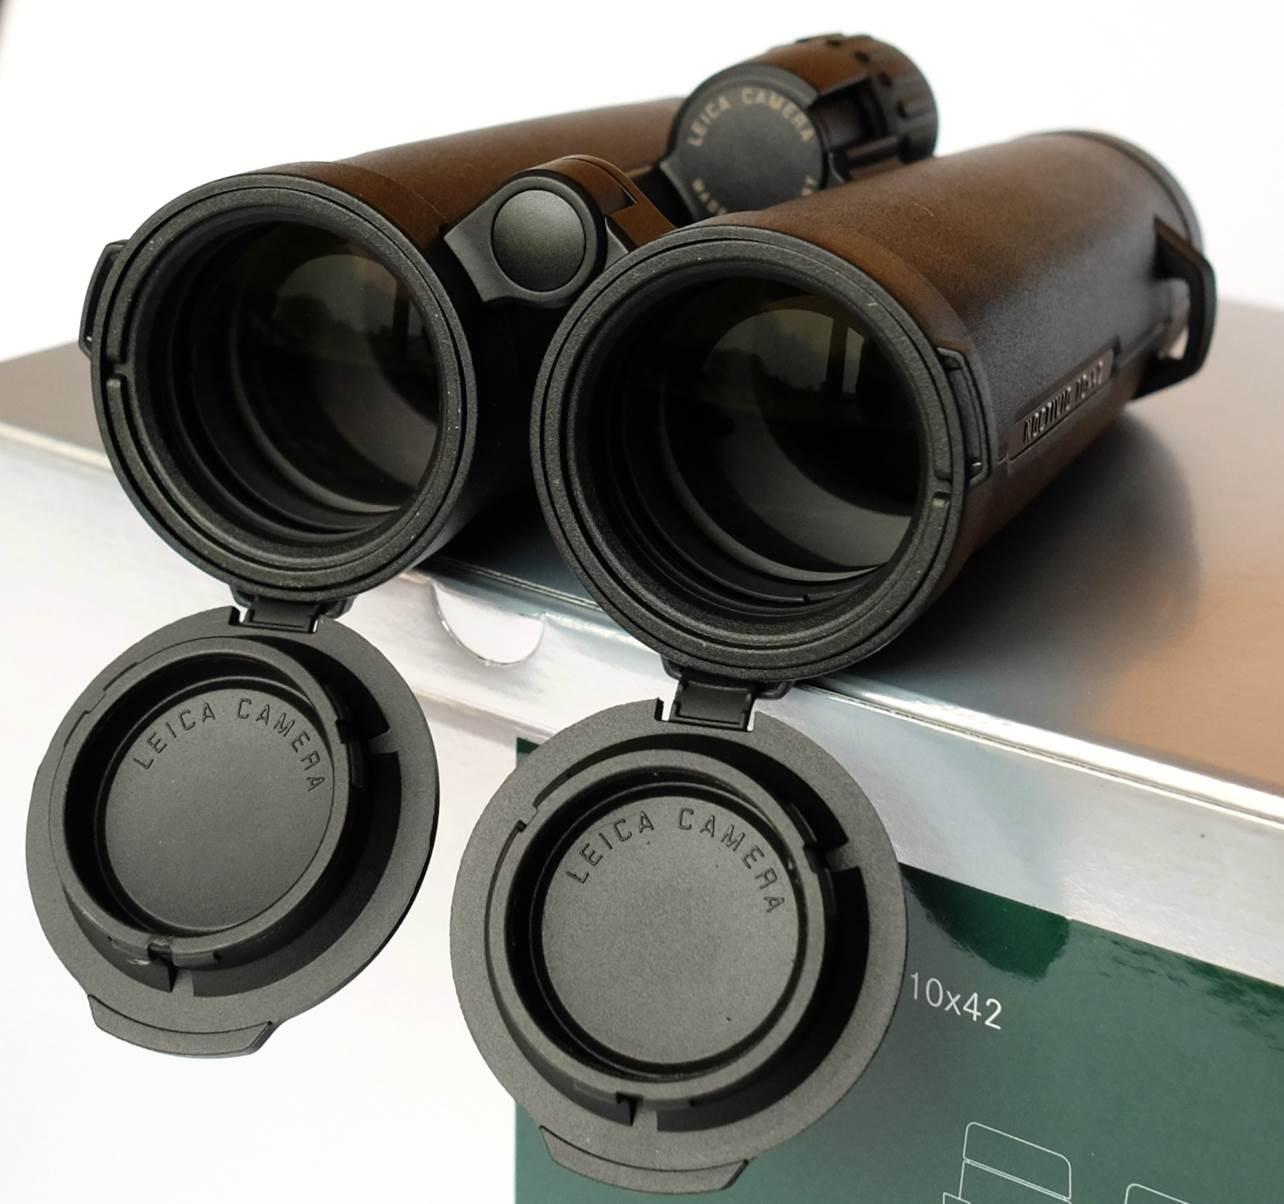 Leica Noctivid 10x42 Review